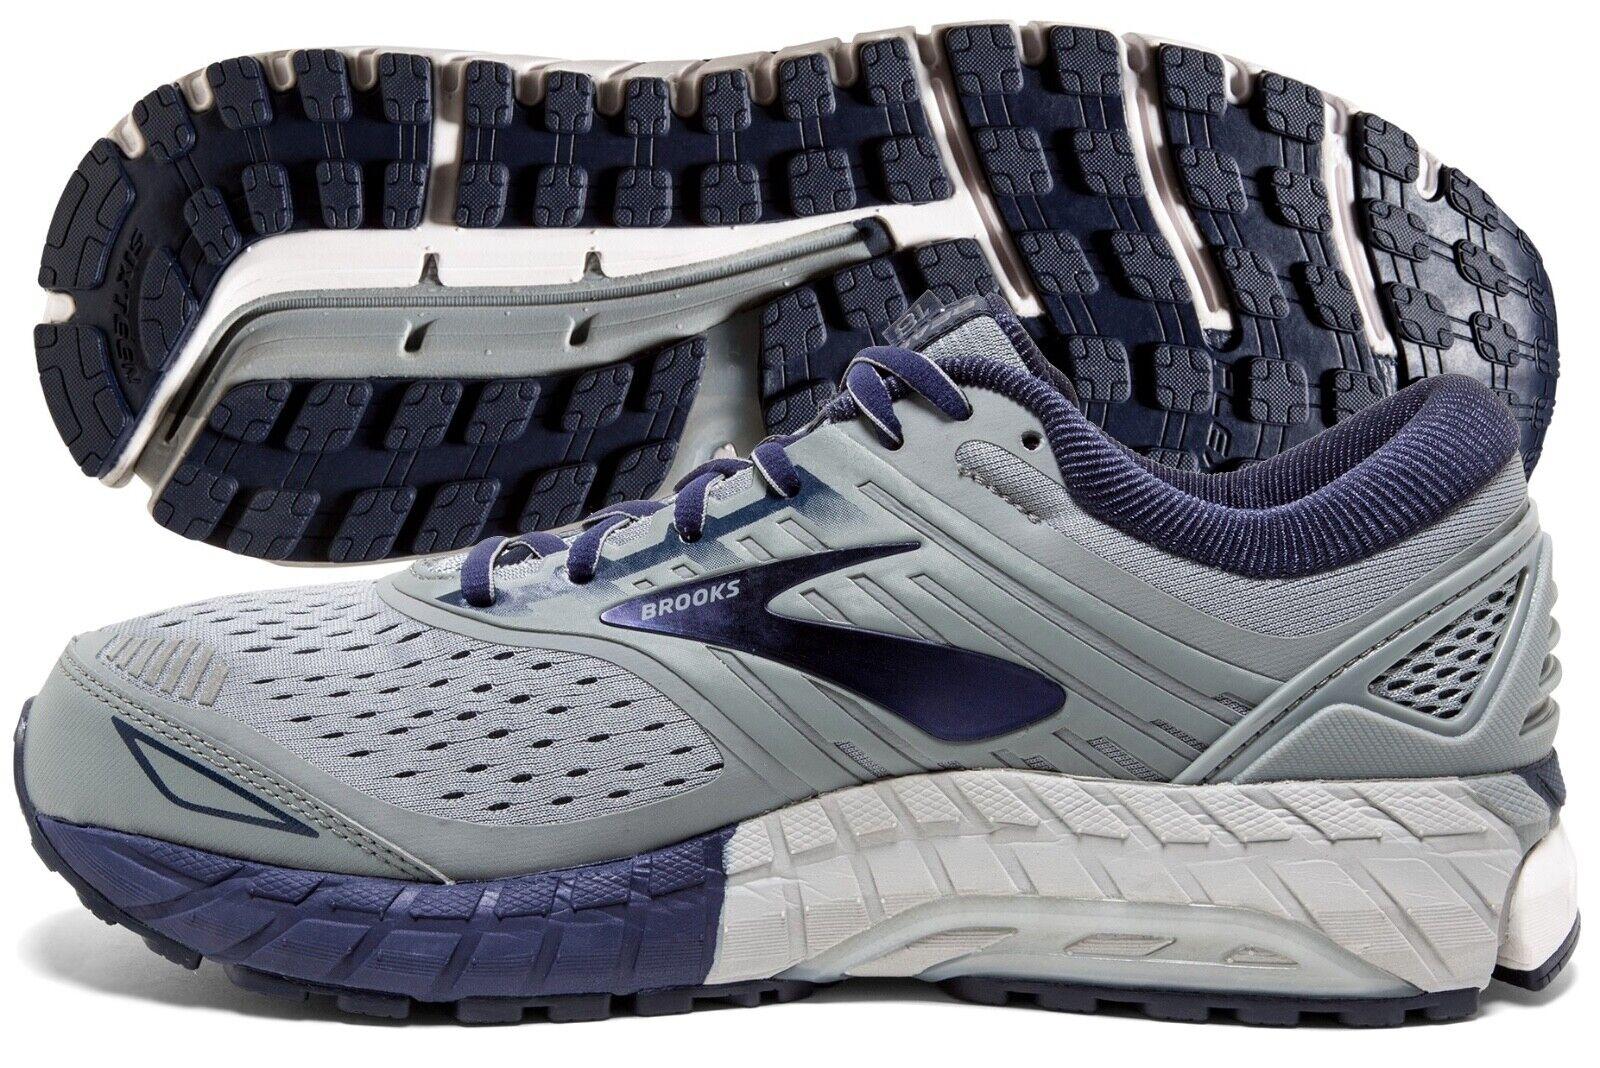 Brooks Beast 18 Mens Running Shoes Grey